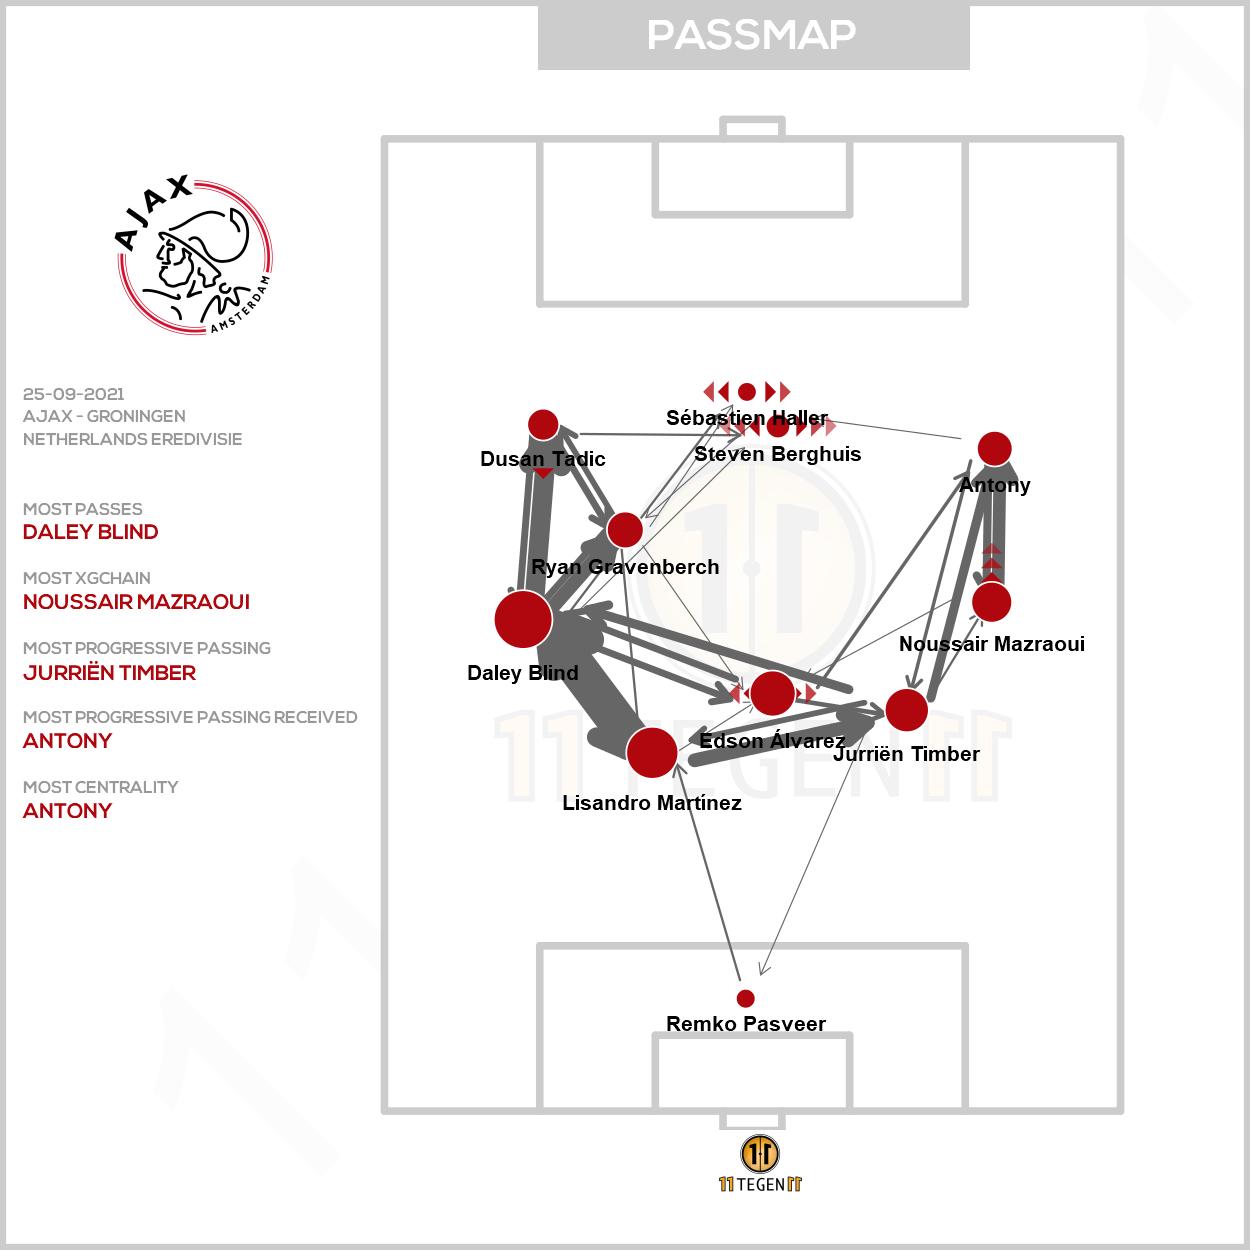 2021 09 25 Passmap Ajax Ajax 3 0 Groningen